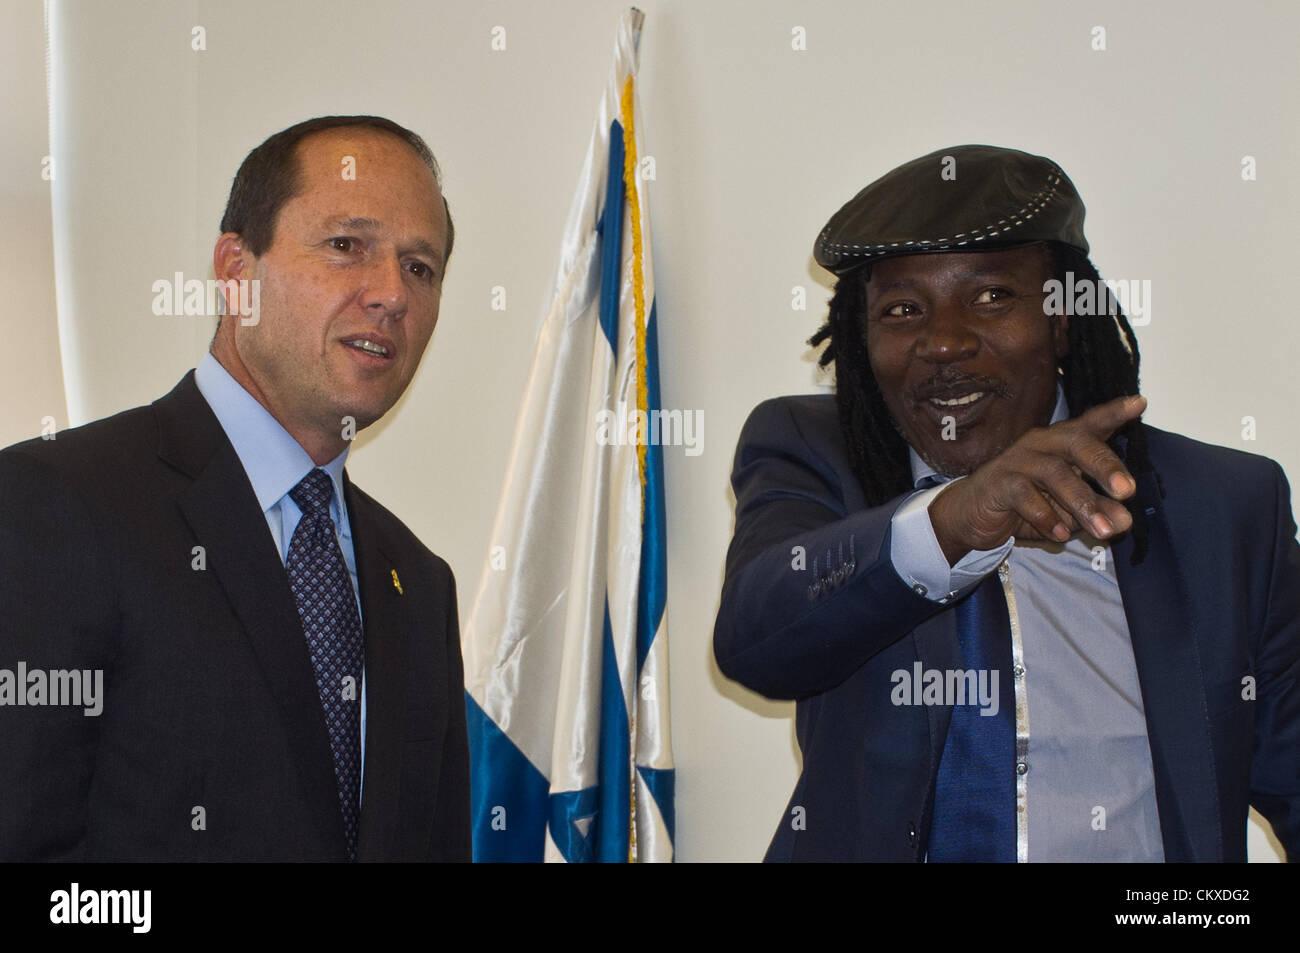 28th Aug 2012. Jerusalem, Israel. Jerusalem Mayor Nir Barkat and reggae musician Alpha Blondy exchange small-talk - Stock Image